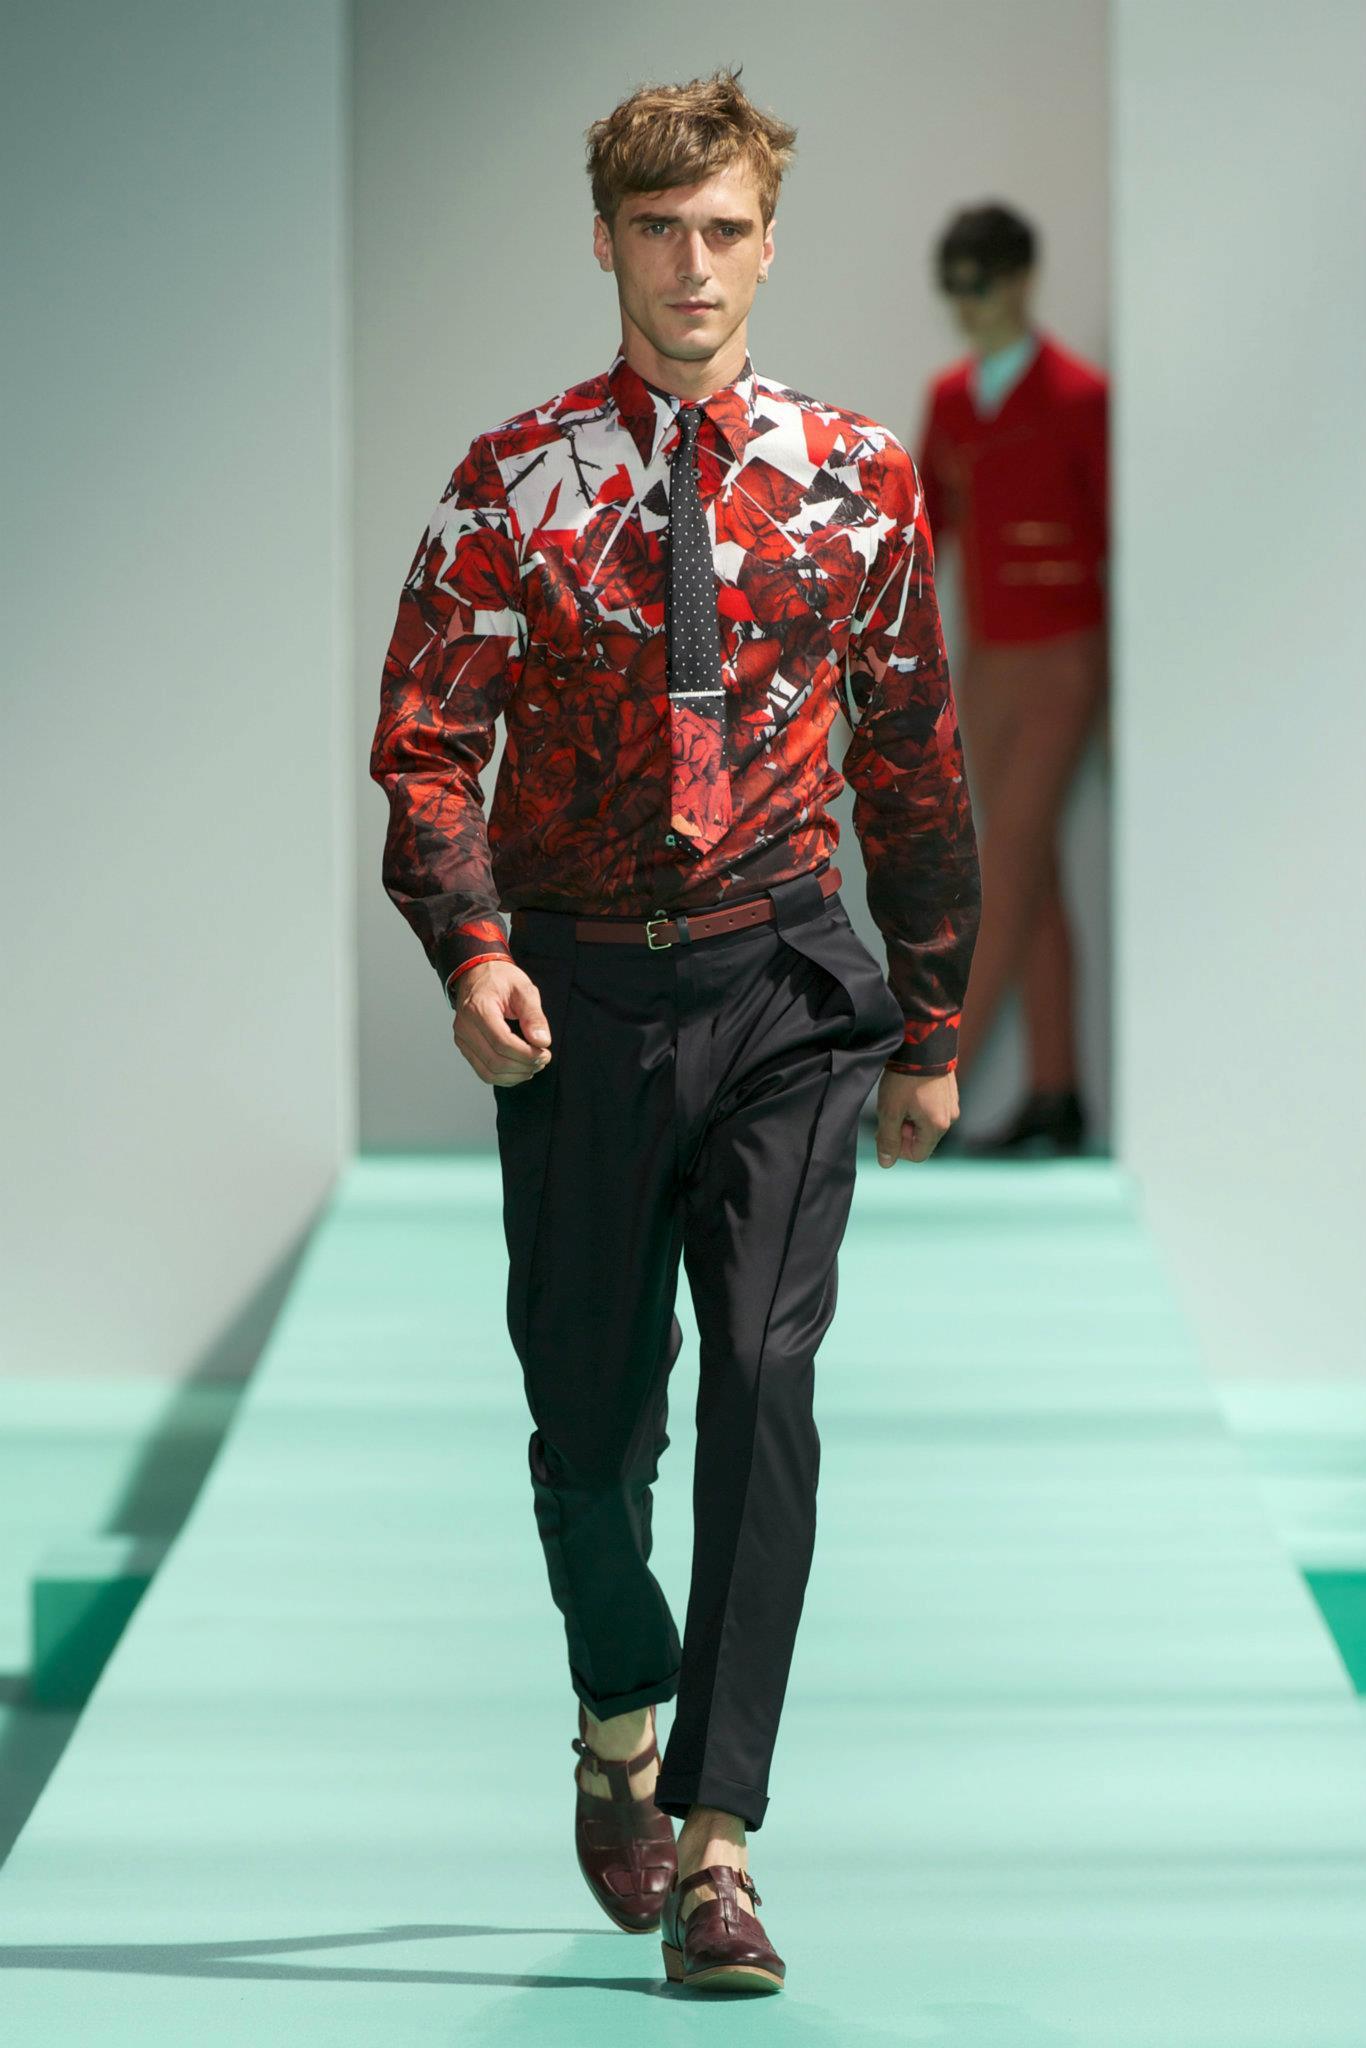 Paul Smith Spring Summer 2013 Menswear Collection